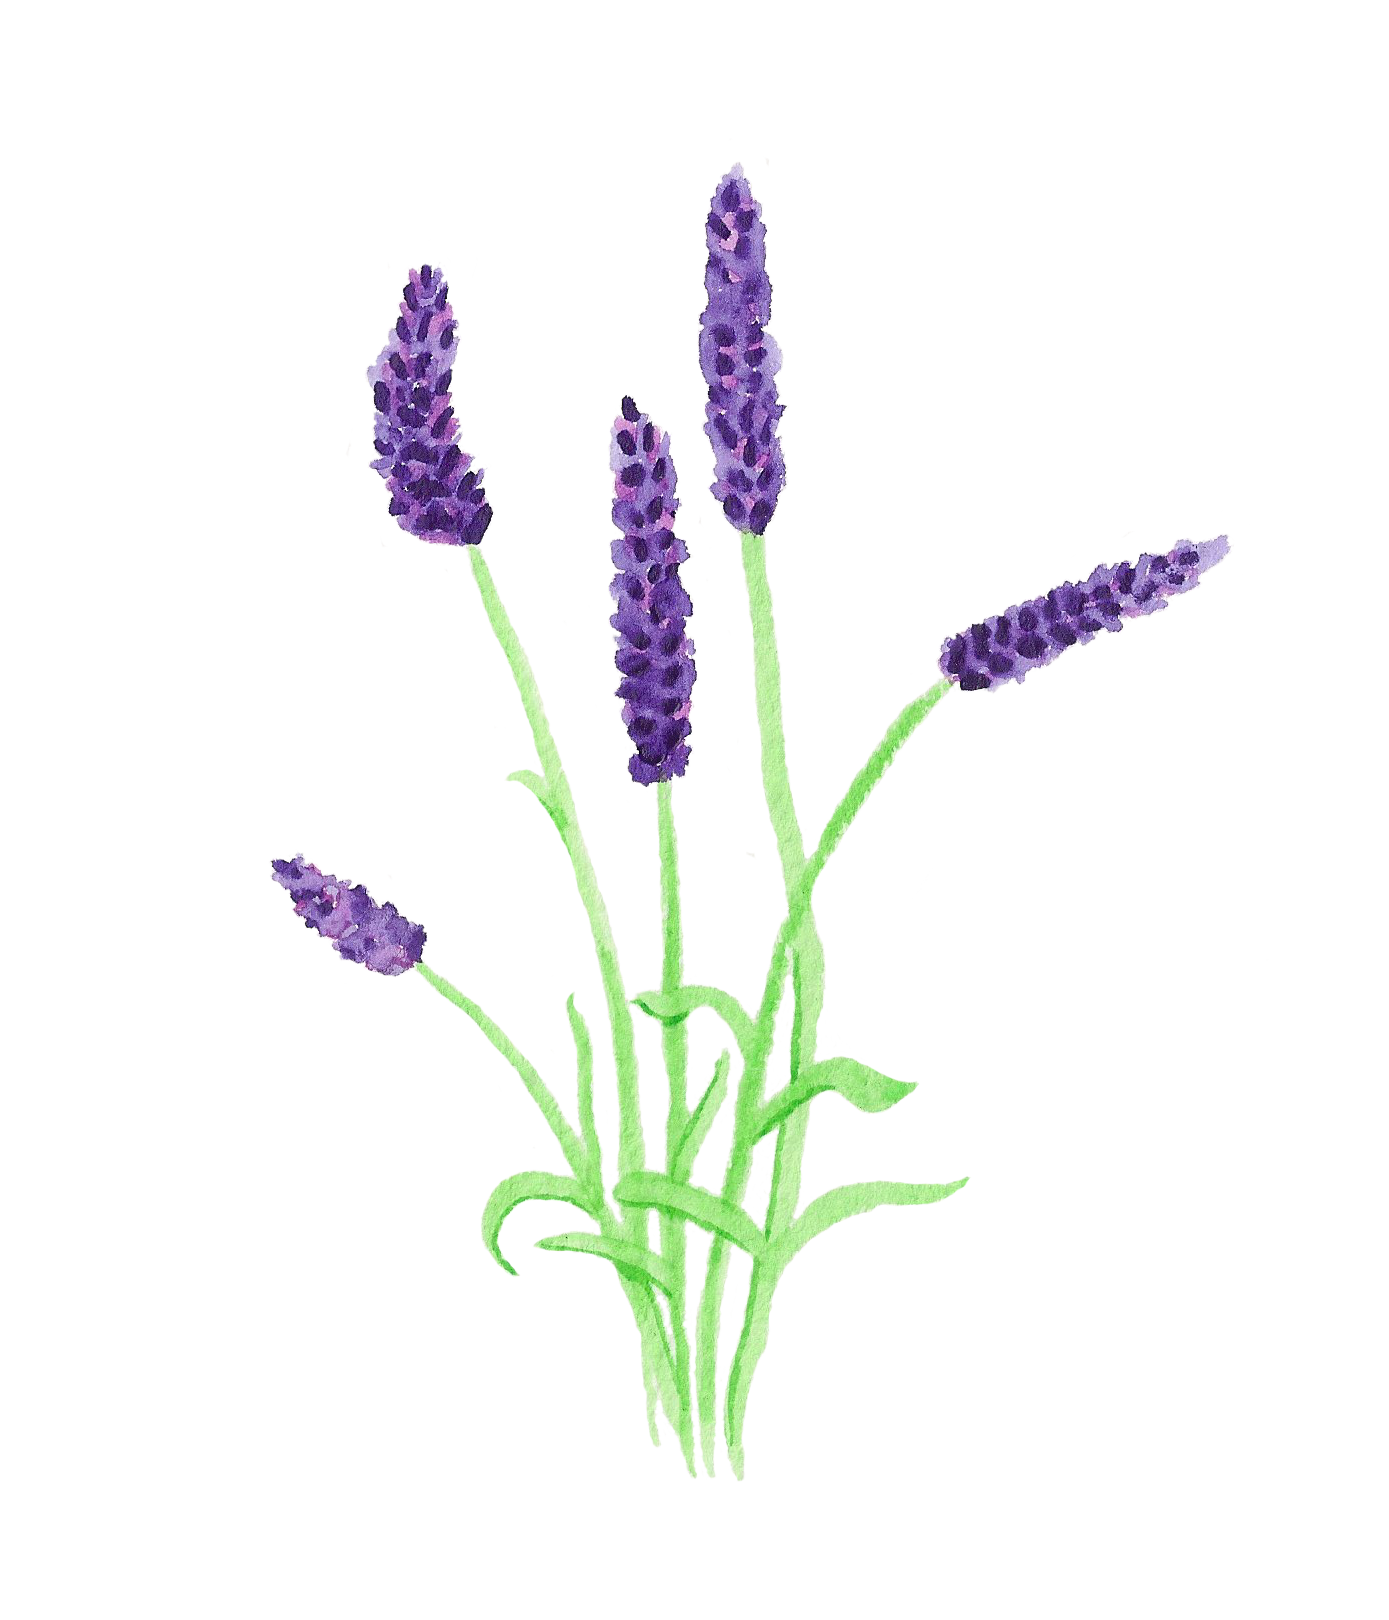 Lavender lavender field